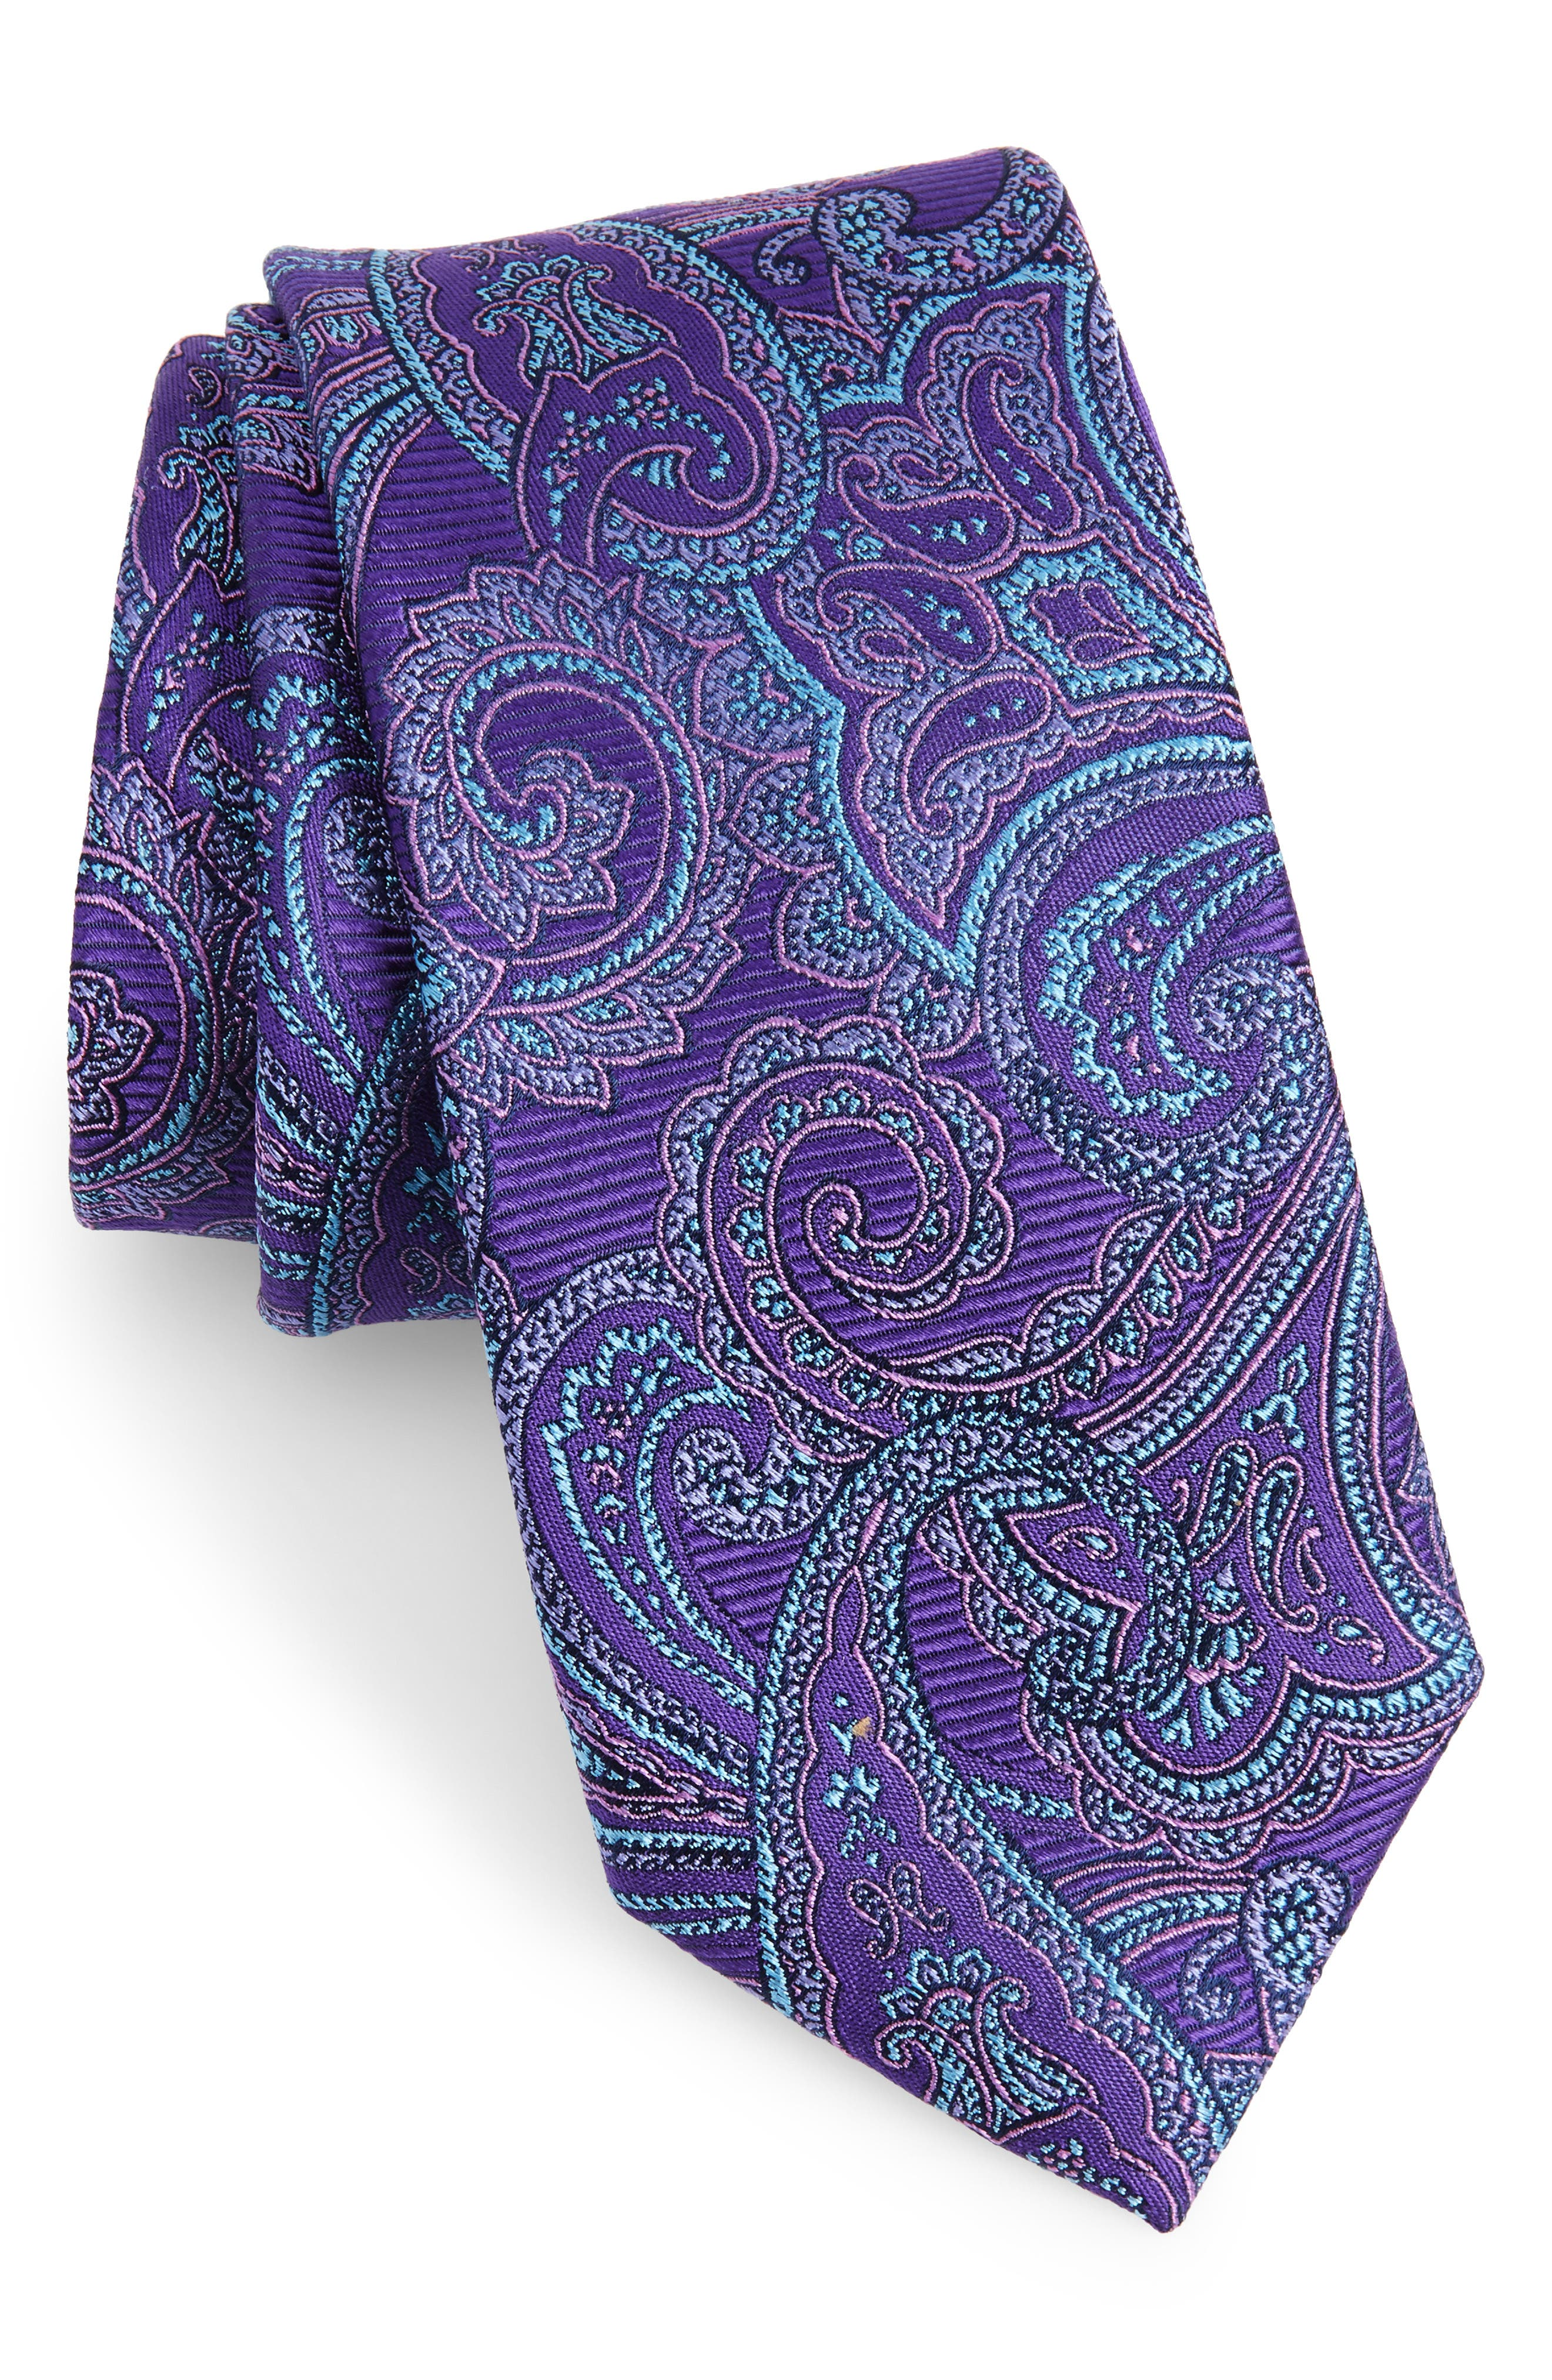 Avalon Paisley Silk Tie,                             Main thumbnail 1, color,                             Purple